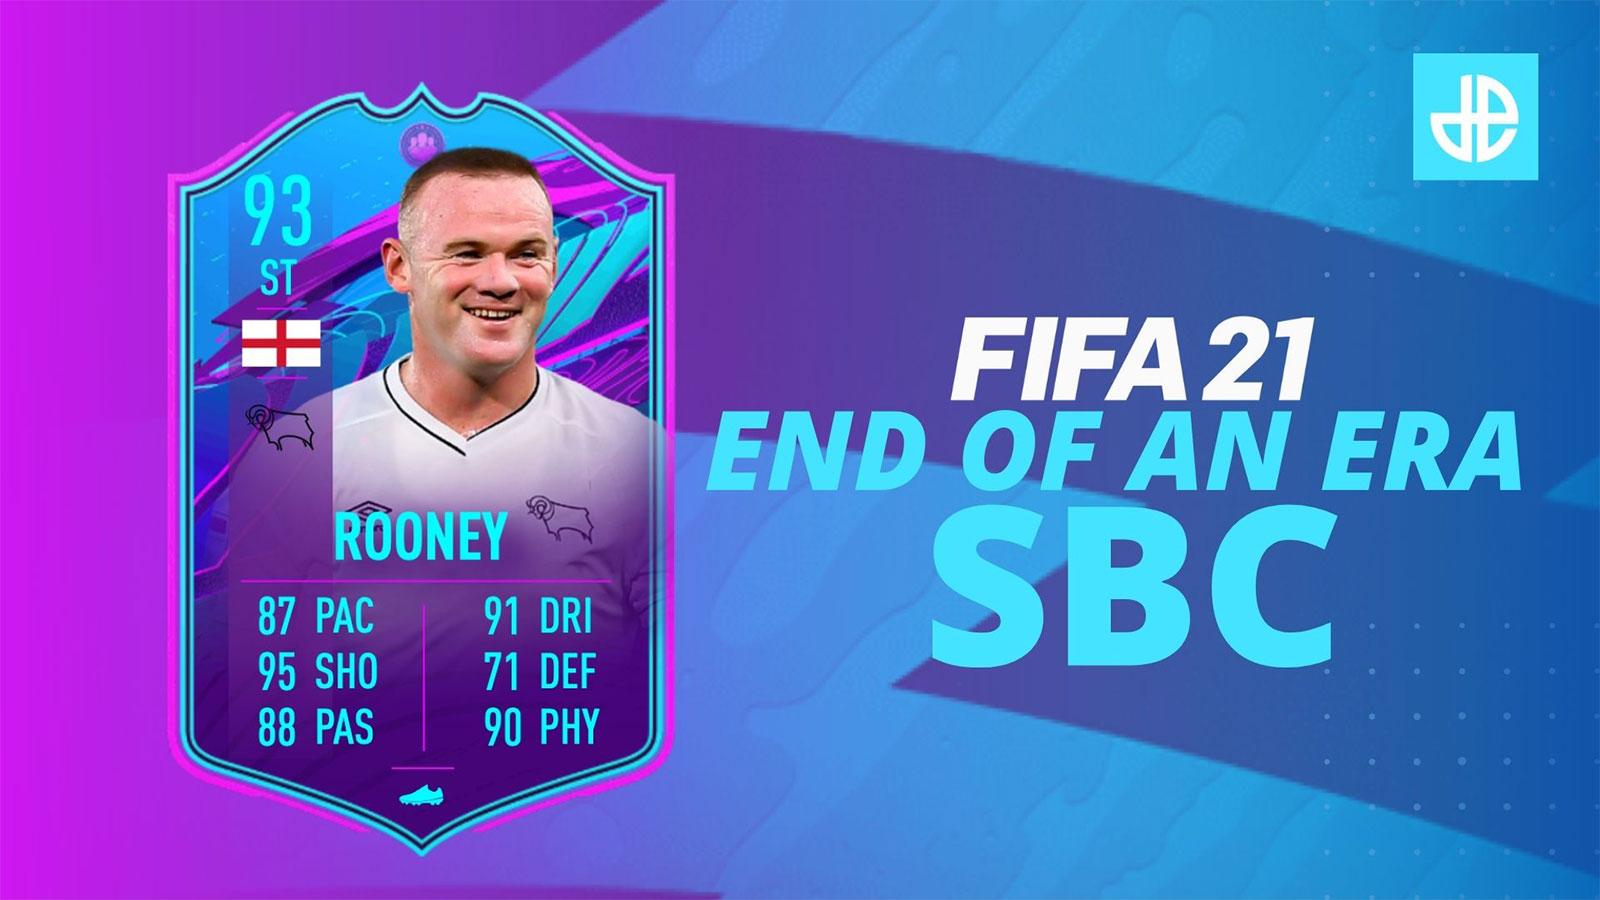 Rooney end of an era SBC FIFA 21